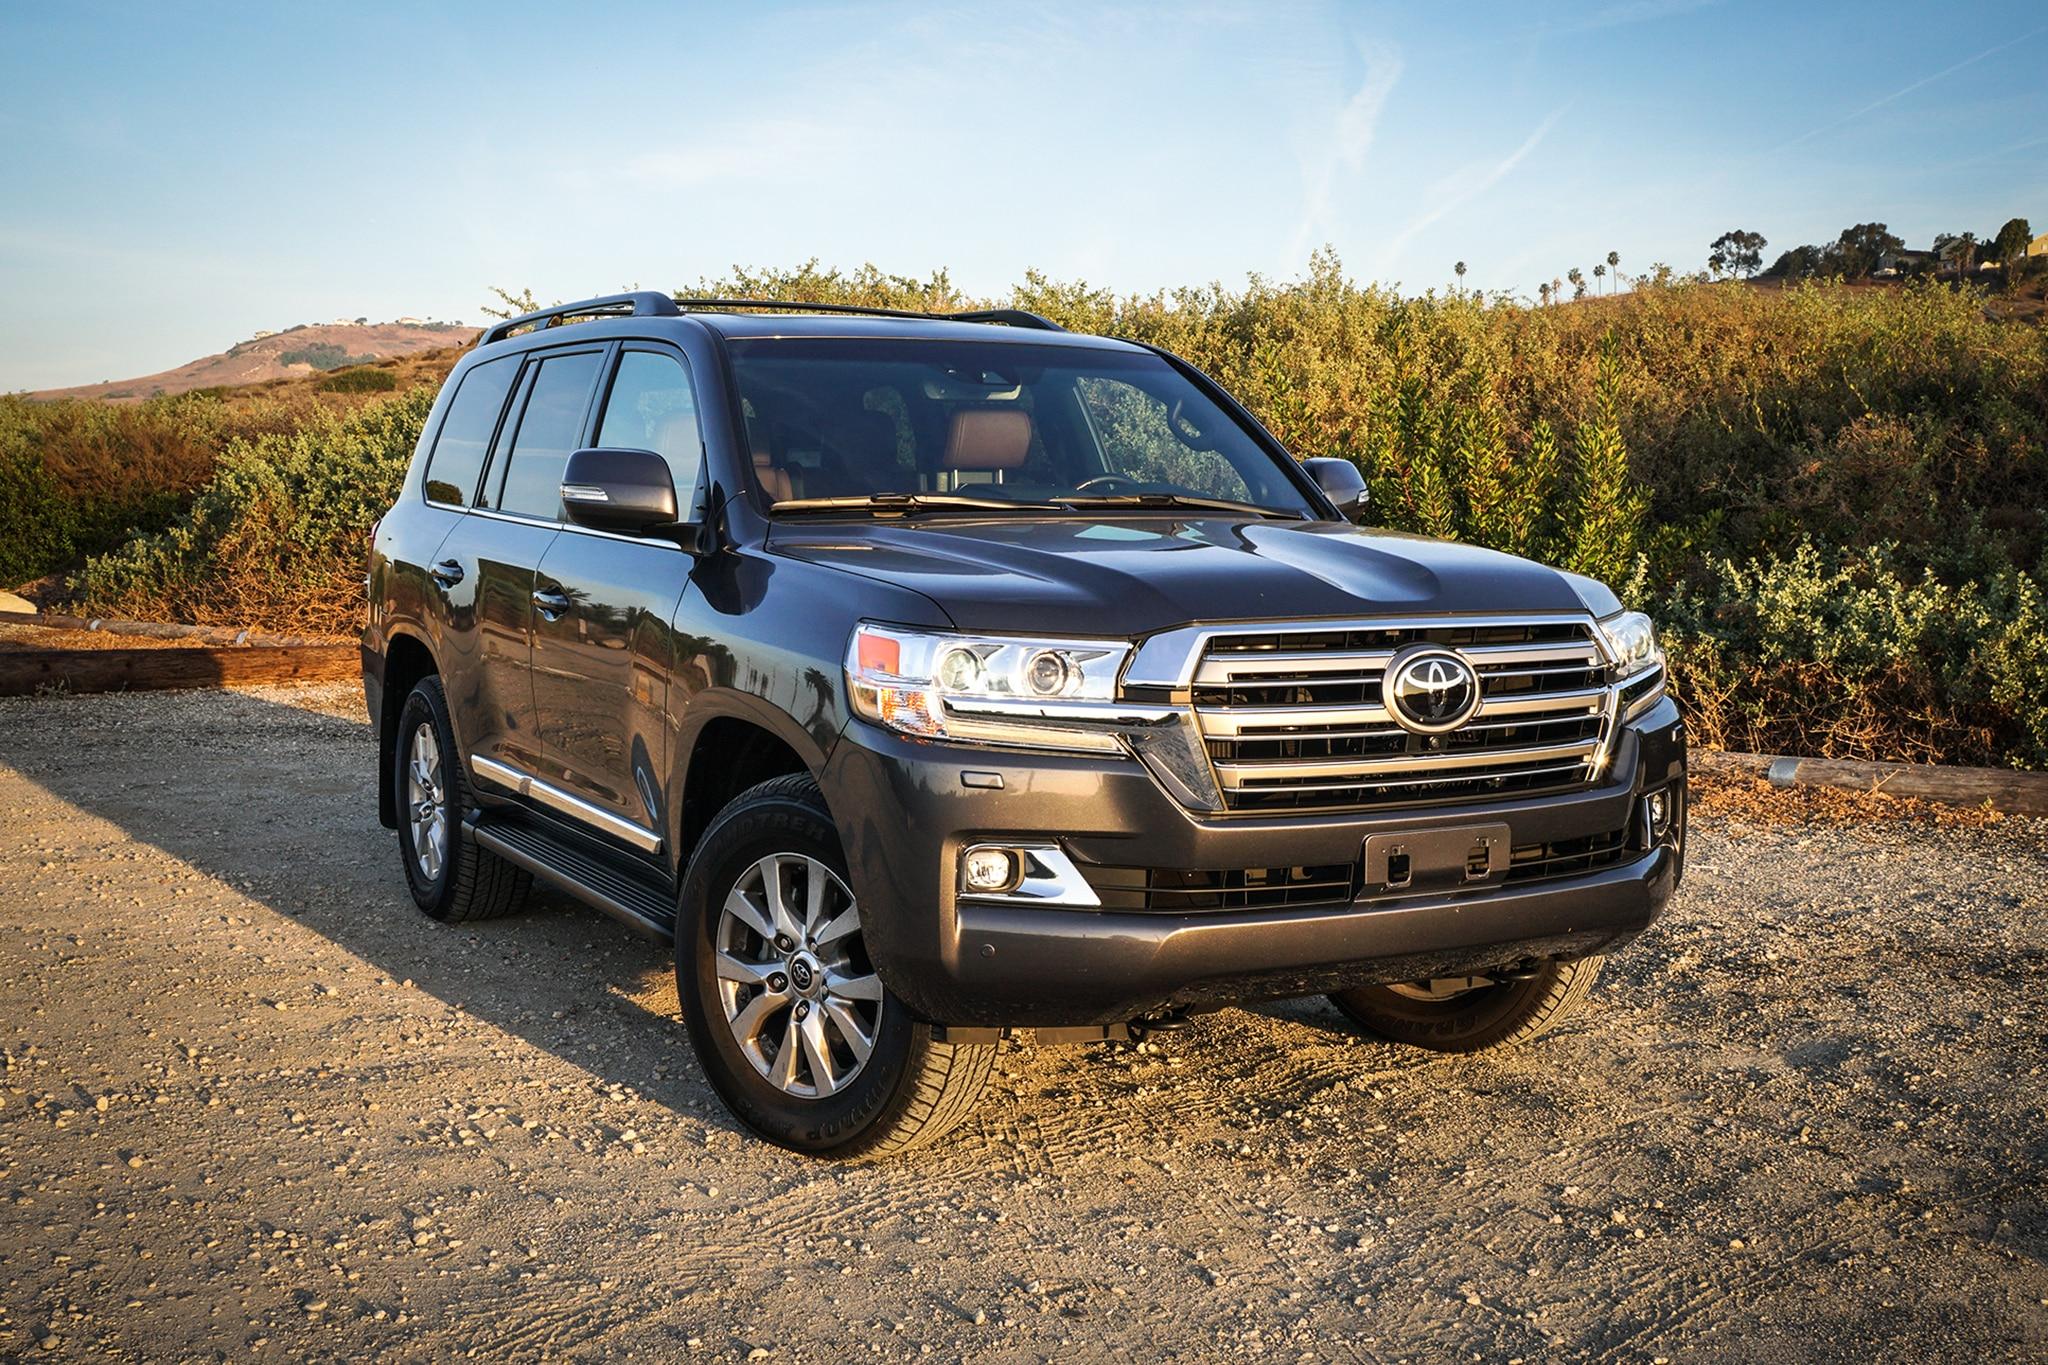 Kekurangan Toyota Land Cruiser 2018 Perbandingan Harga